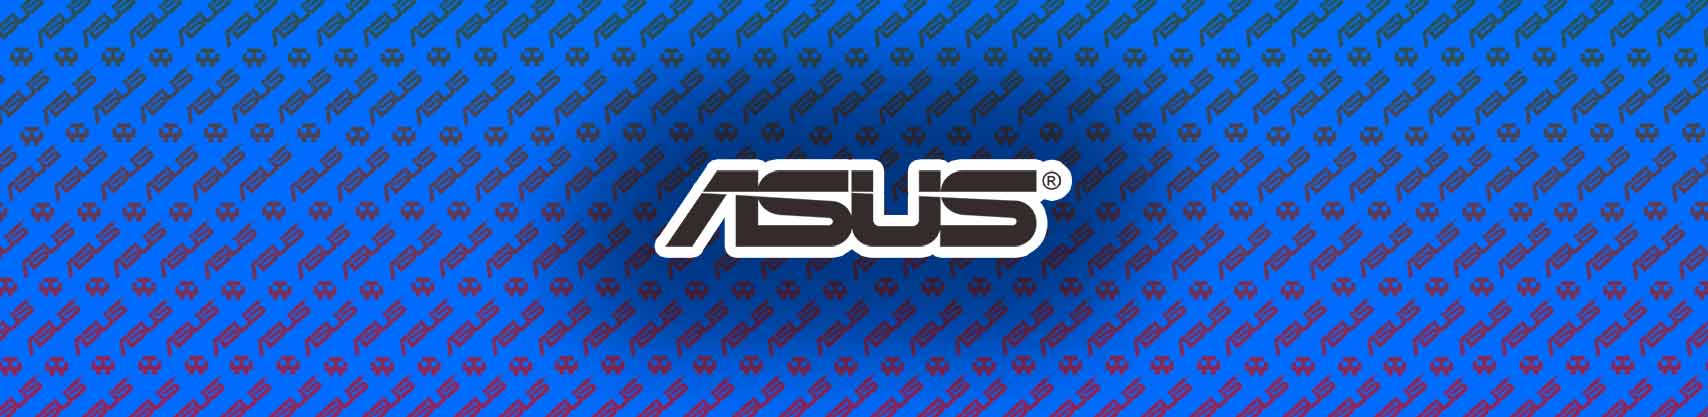 Asus M5A99FX Pro R2.0 Manual